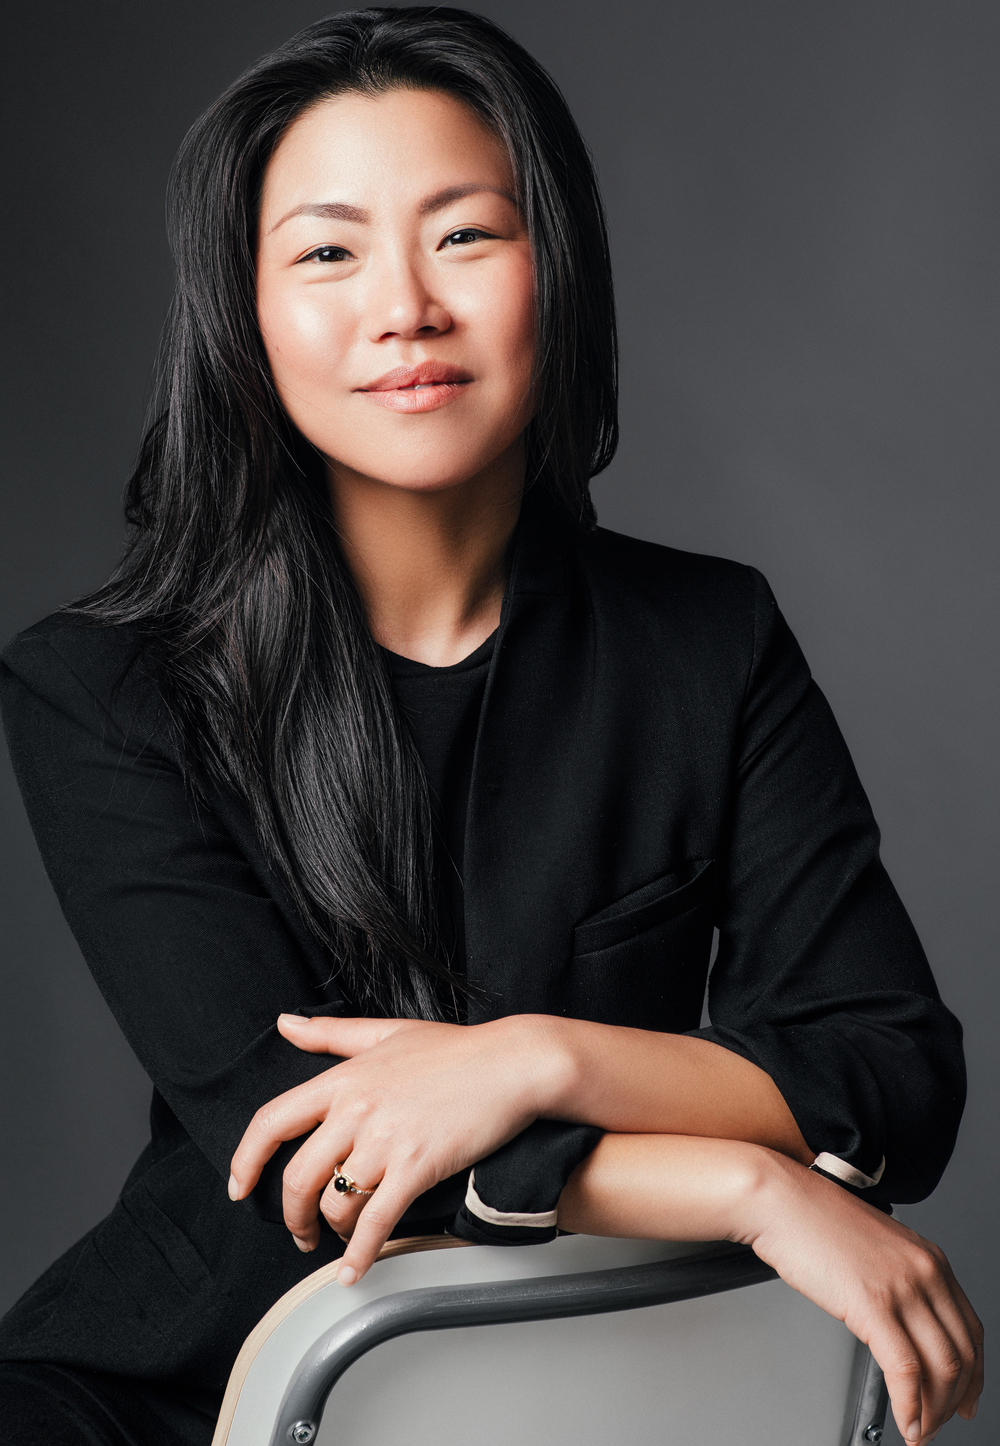 CEO-portrait-corporate-headshot-15.jpg